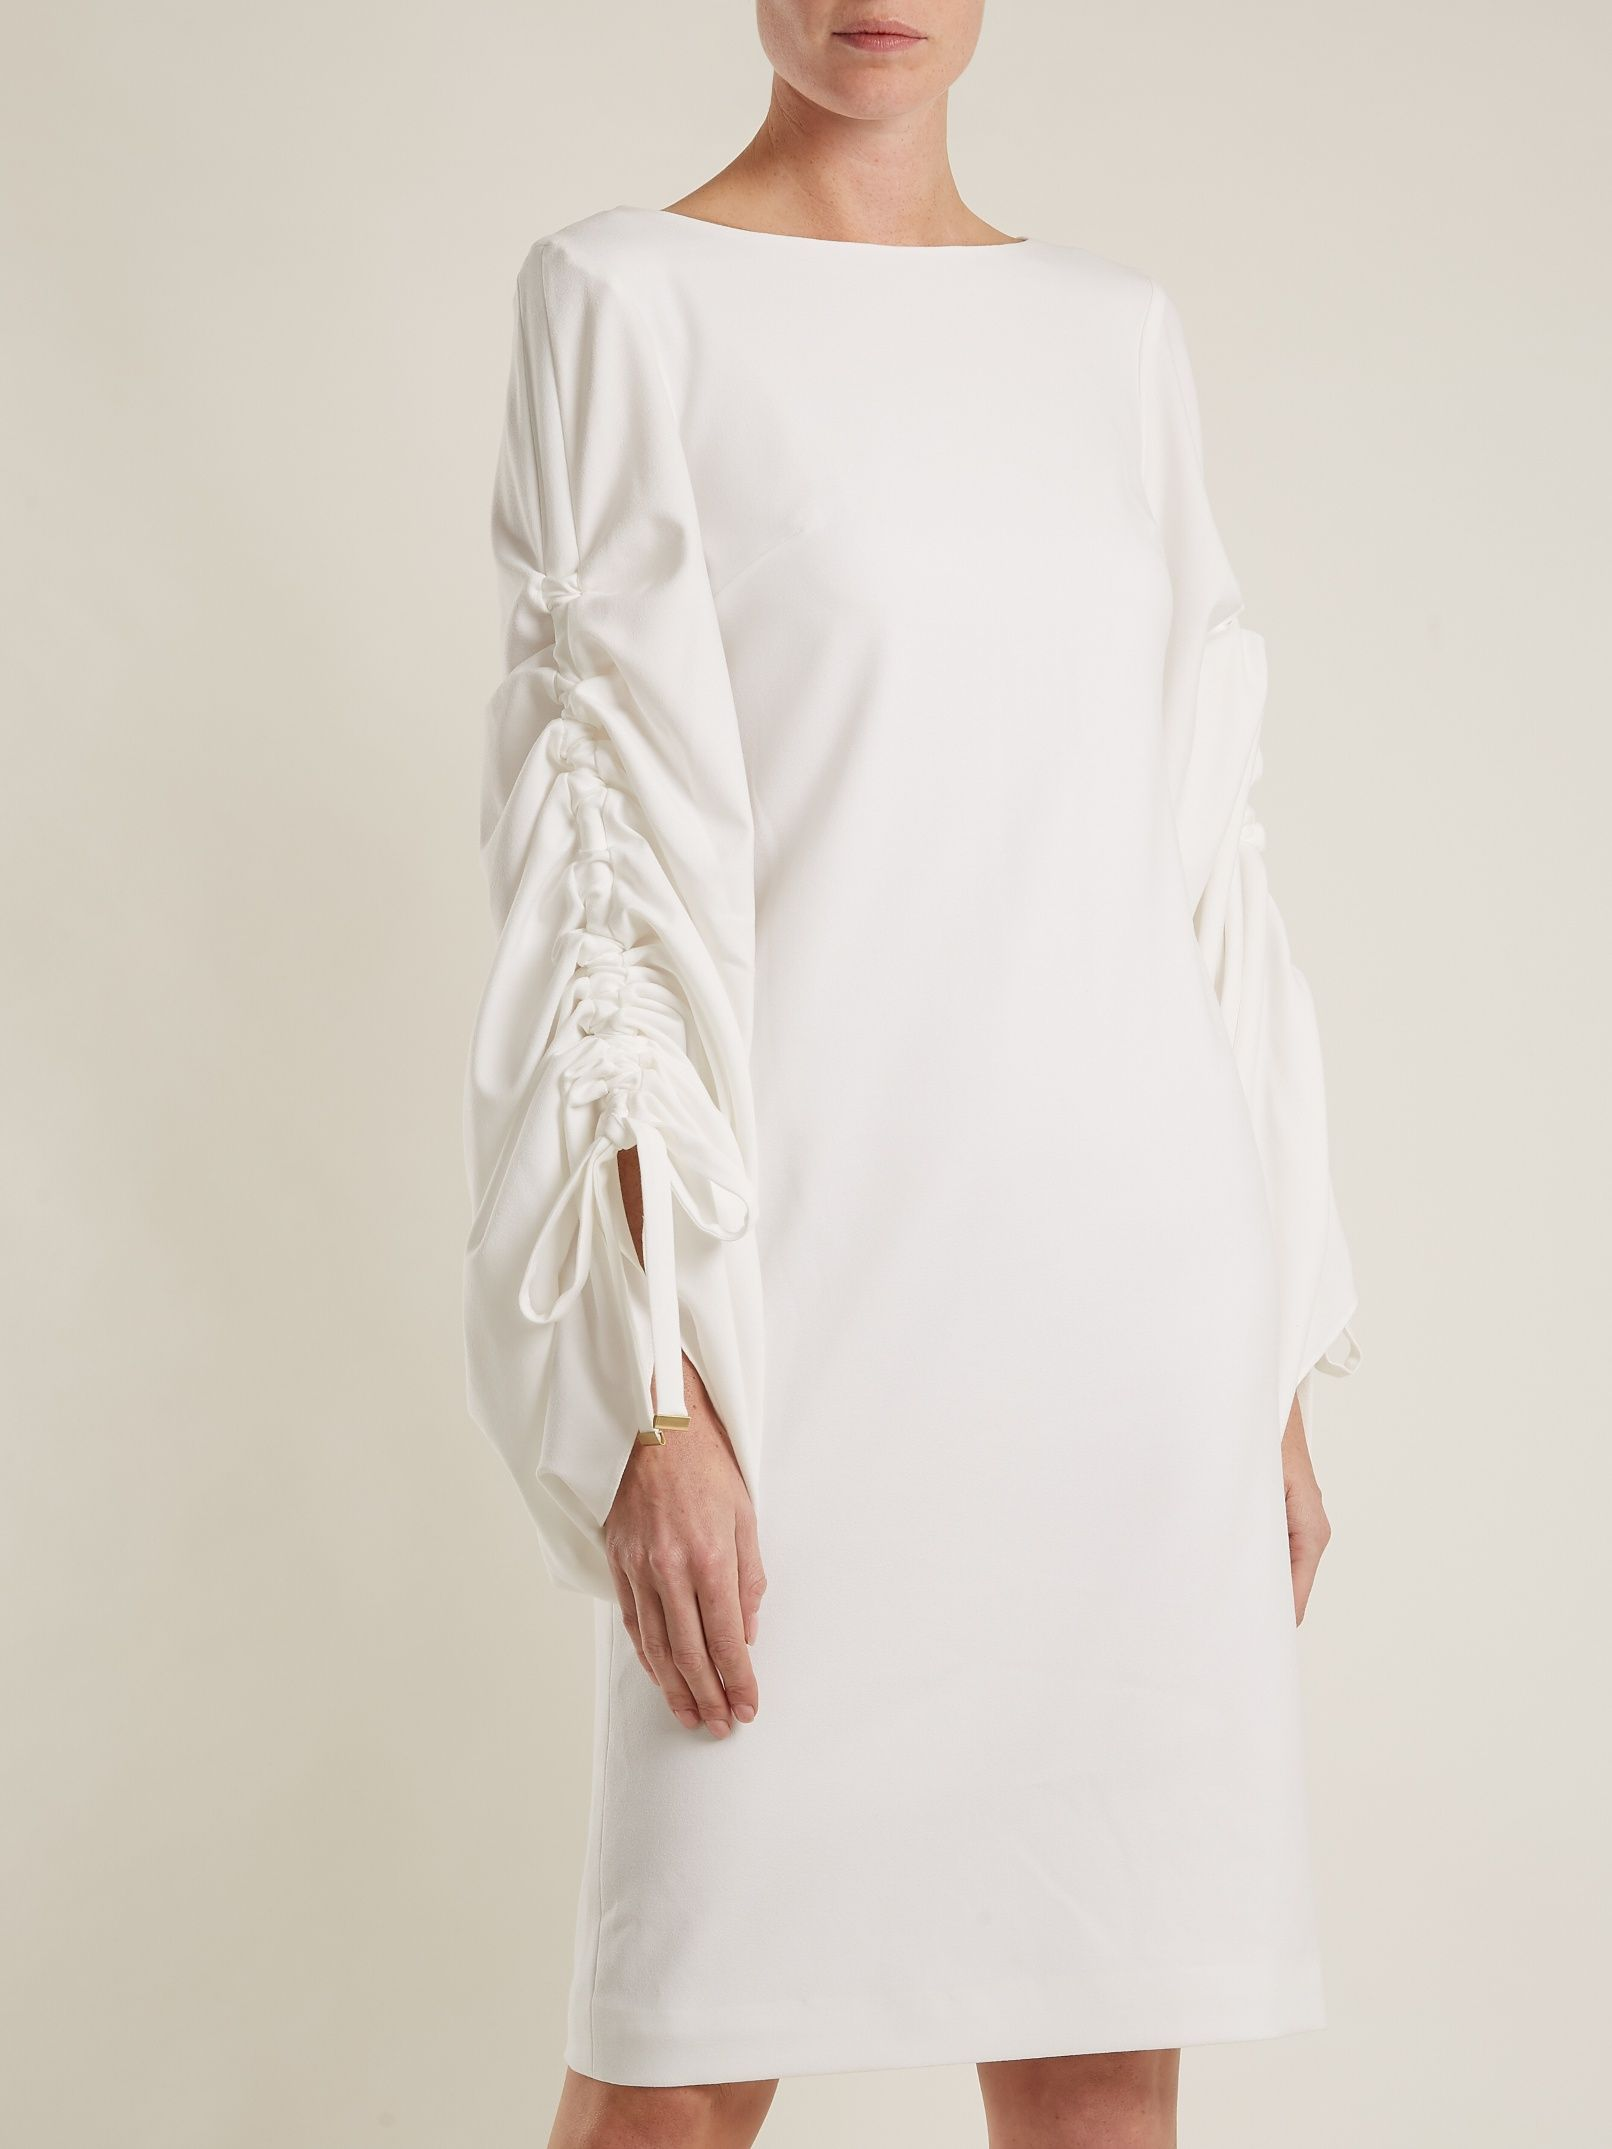 Talitha gathered-sleeves dress Osman SdJY3oR